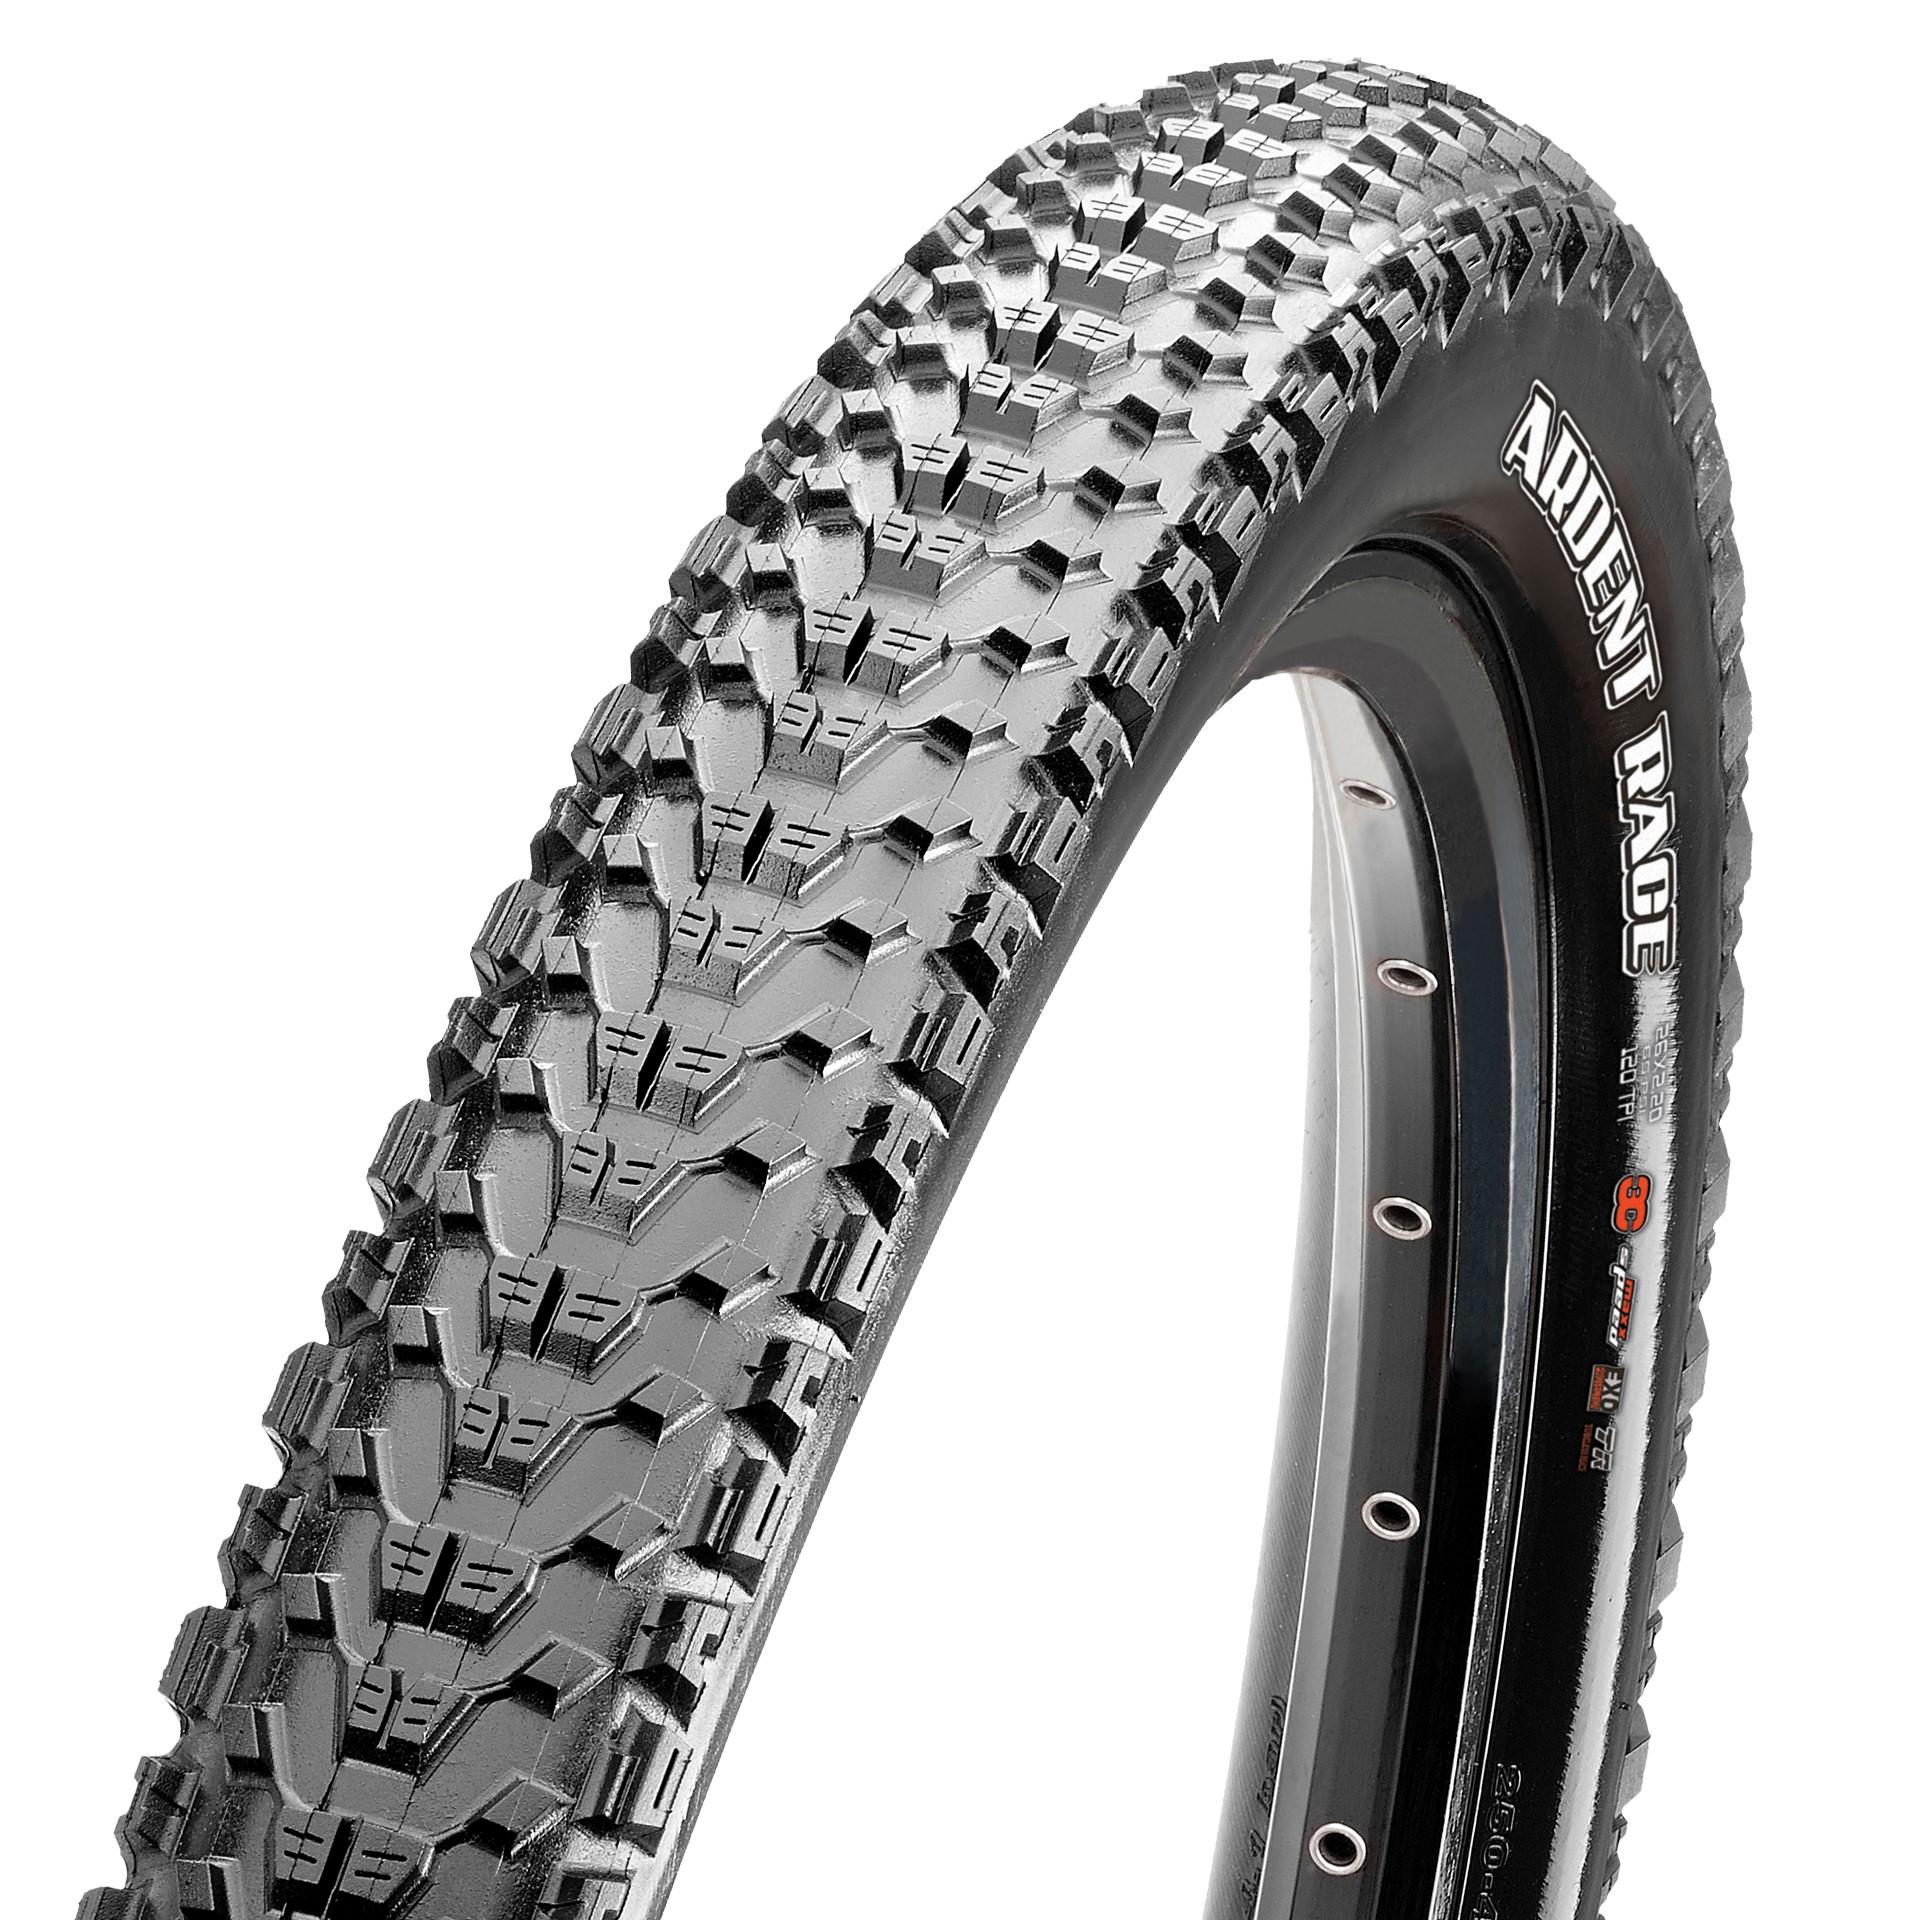 maxxis pneu ardent race kevlar 3c tubeless ready souple. Black Bedroom Furniture Sets. Home Design Ideas